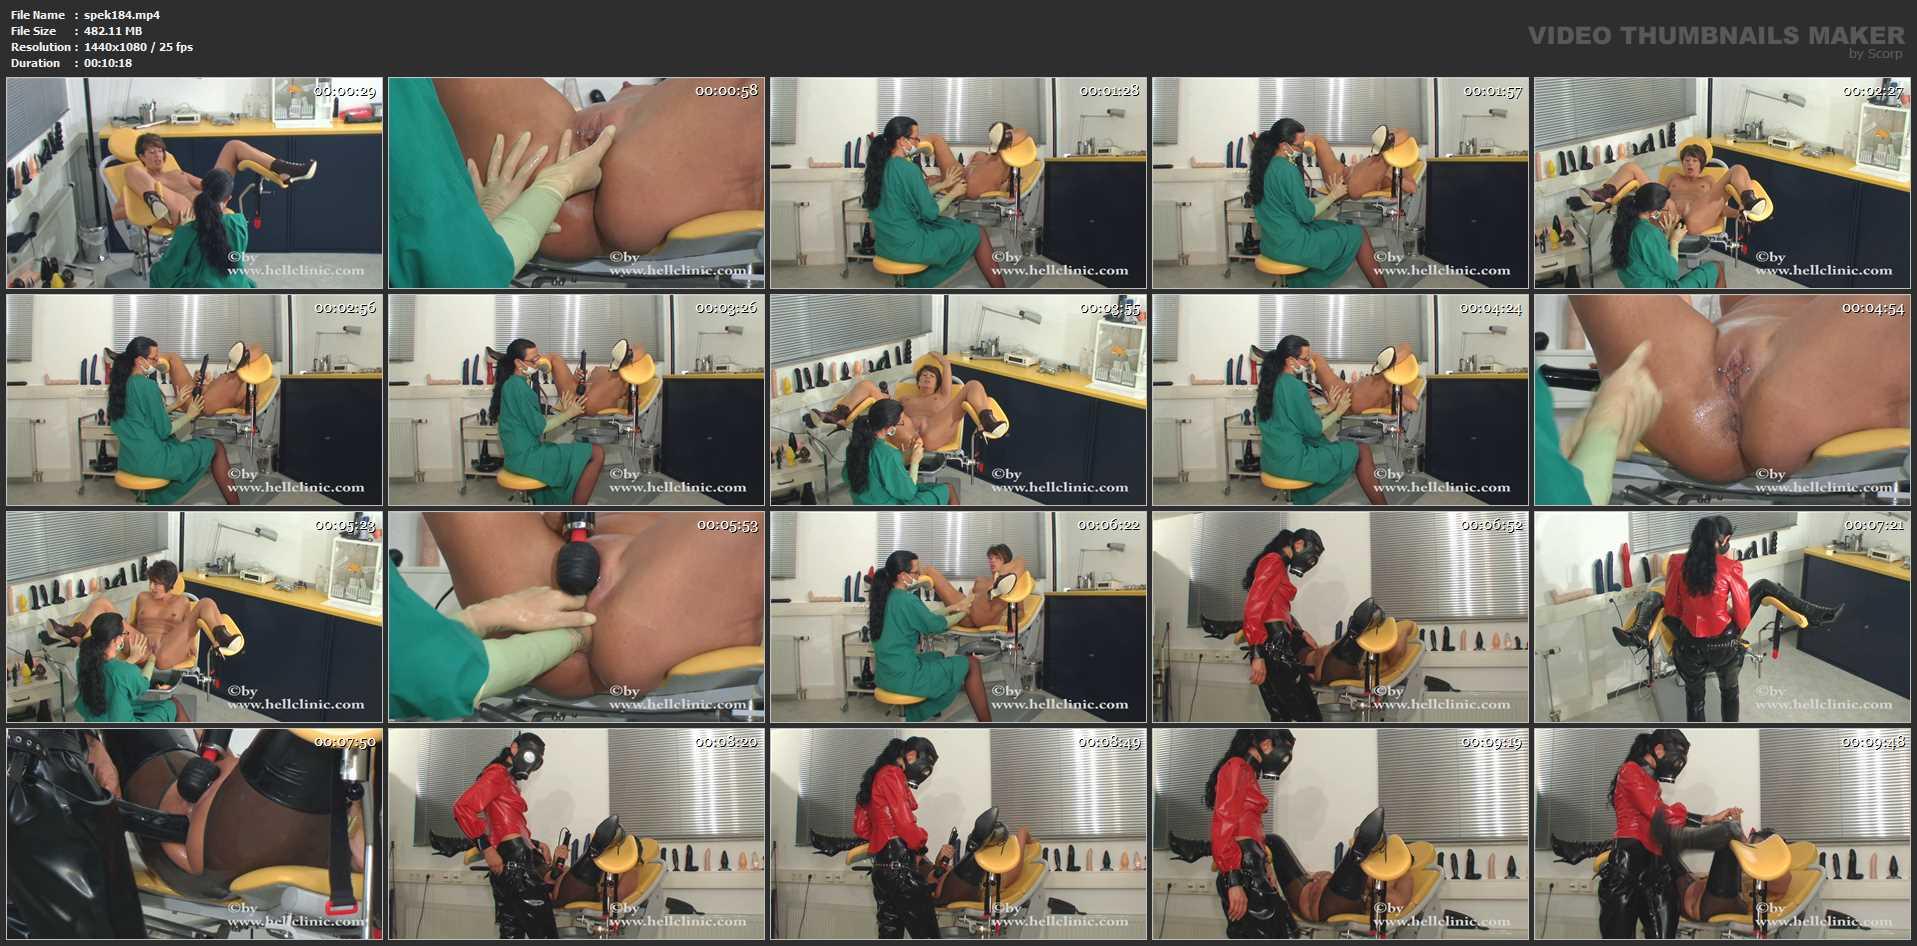 [SPEKULA] With lady Ginga [FULL HD][1080p][MP4]